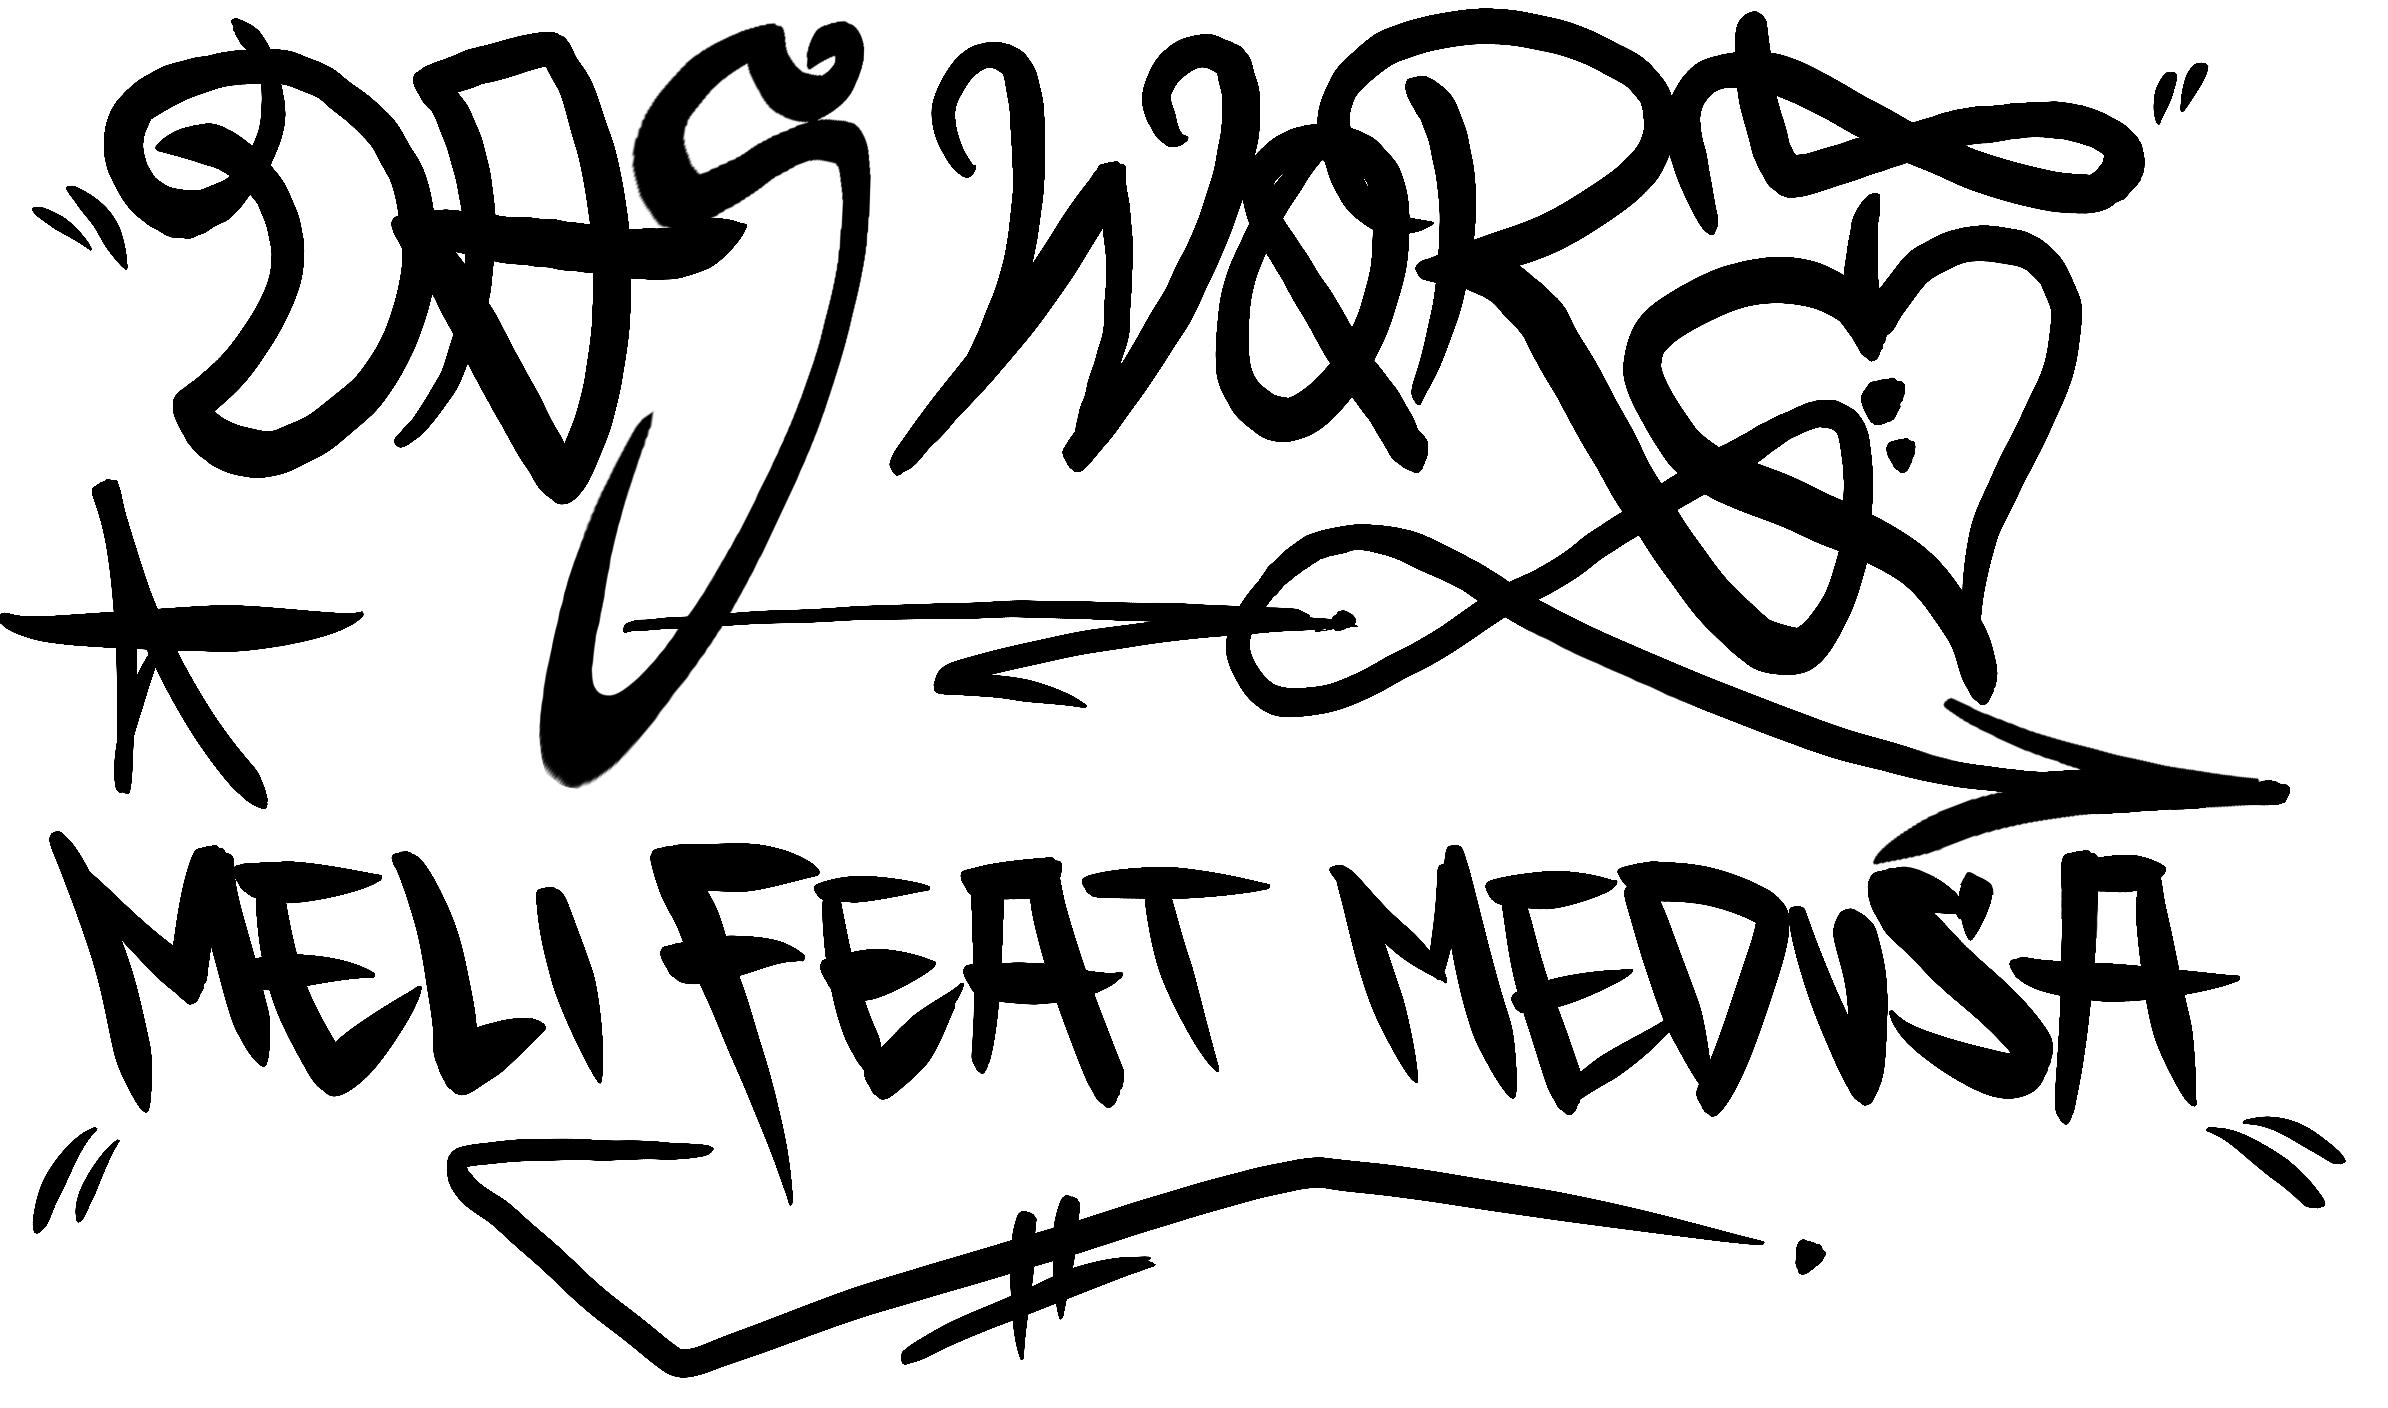 Meli-Pressefoto-Das Wort